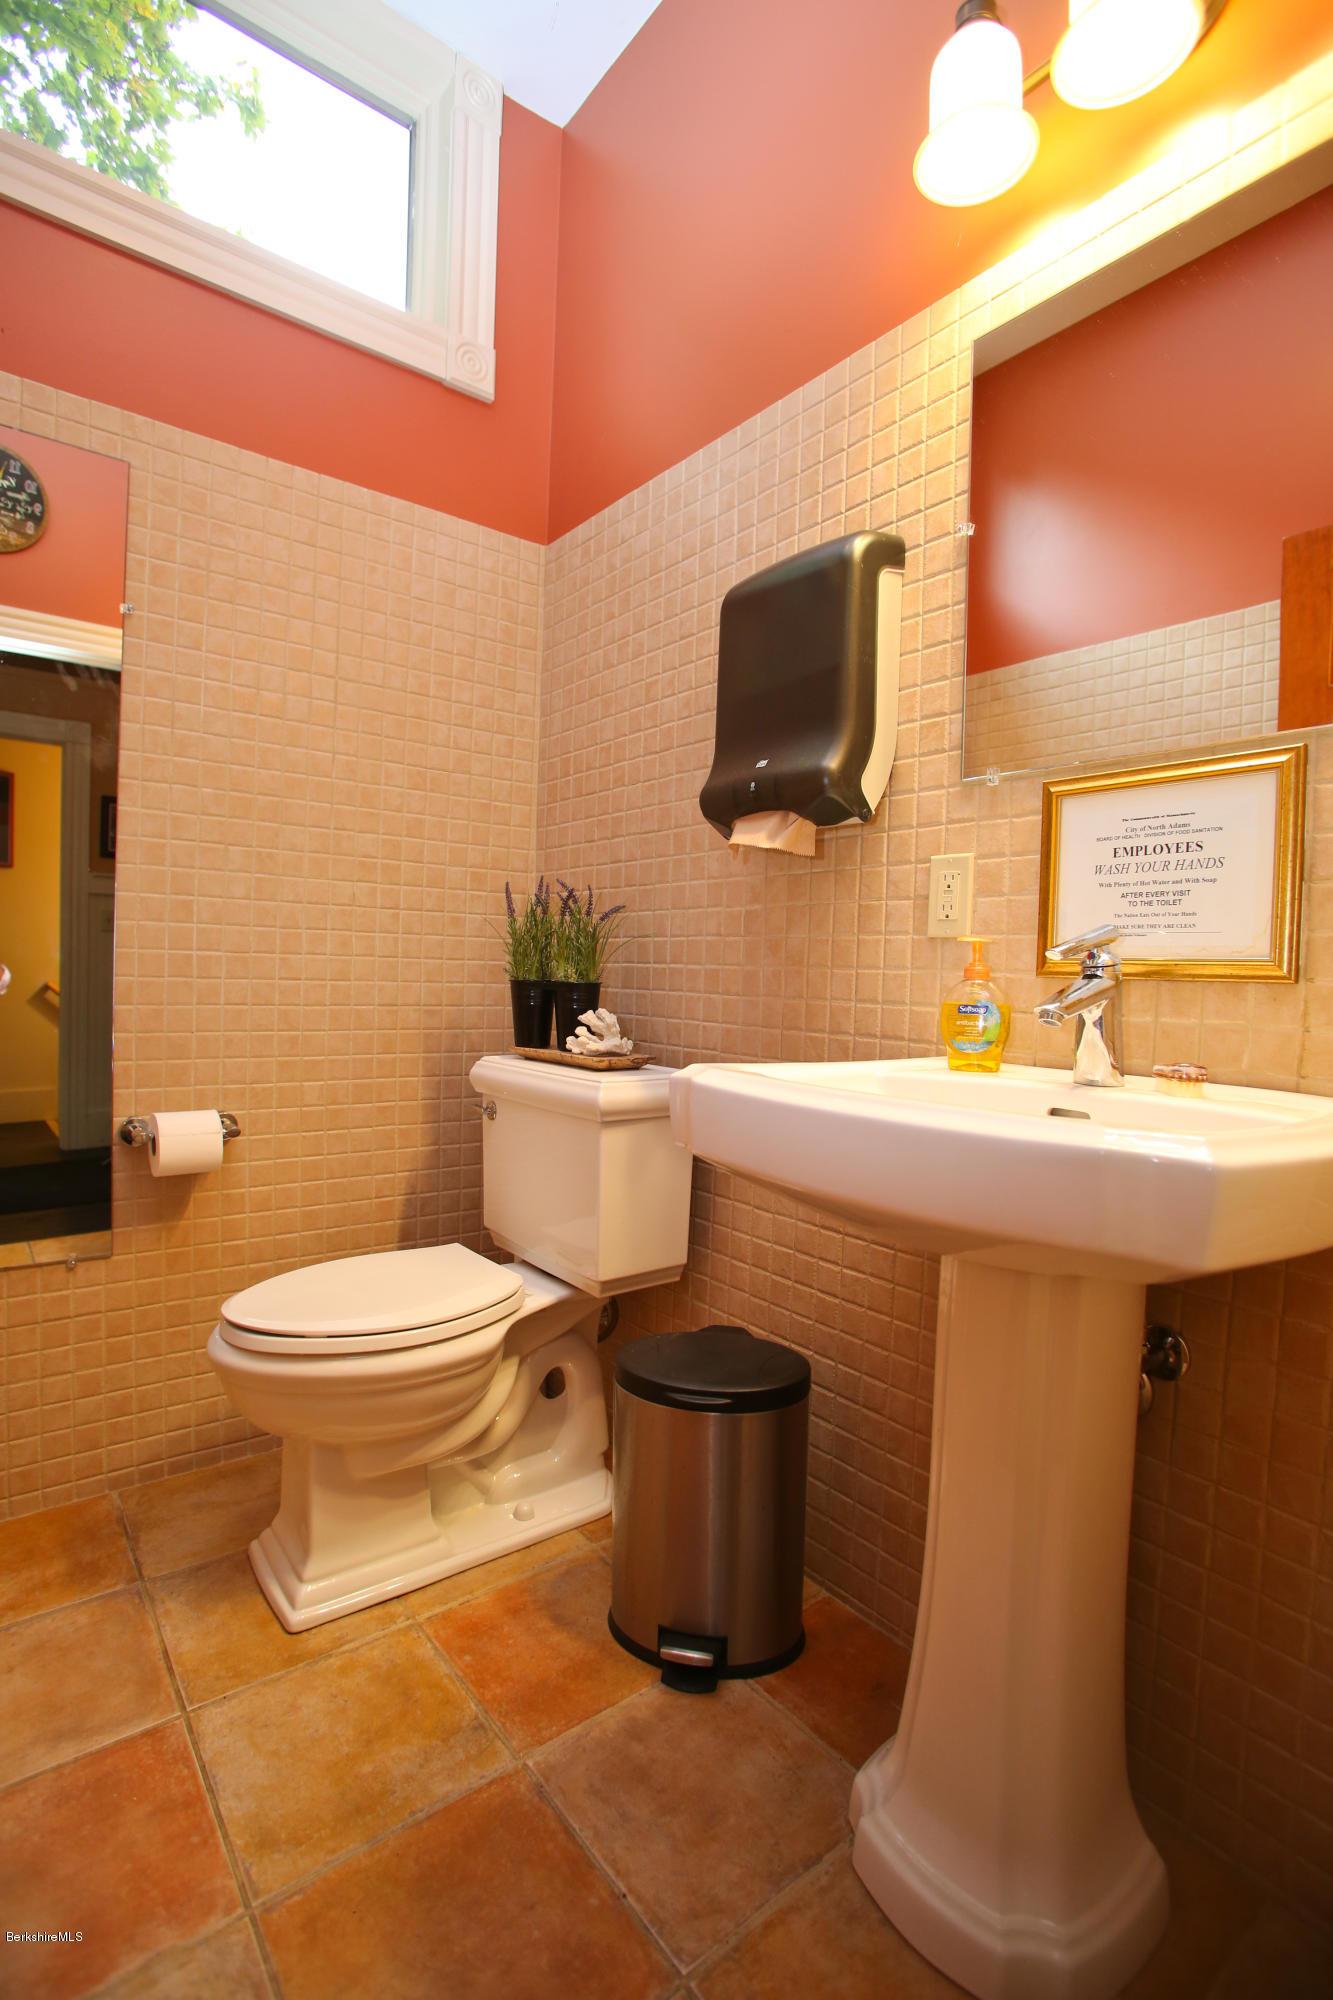 Property located at 437 Main St North Adams MA 01247 photo